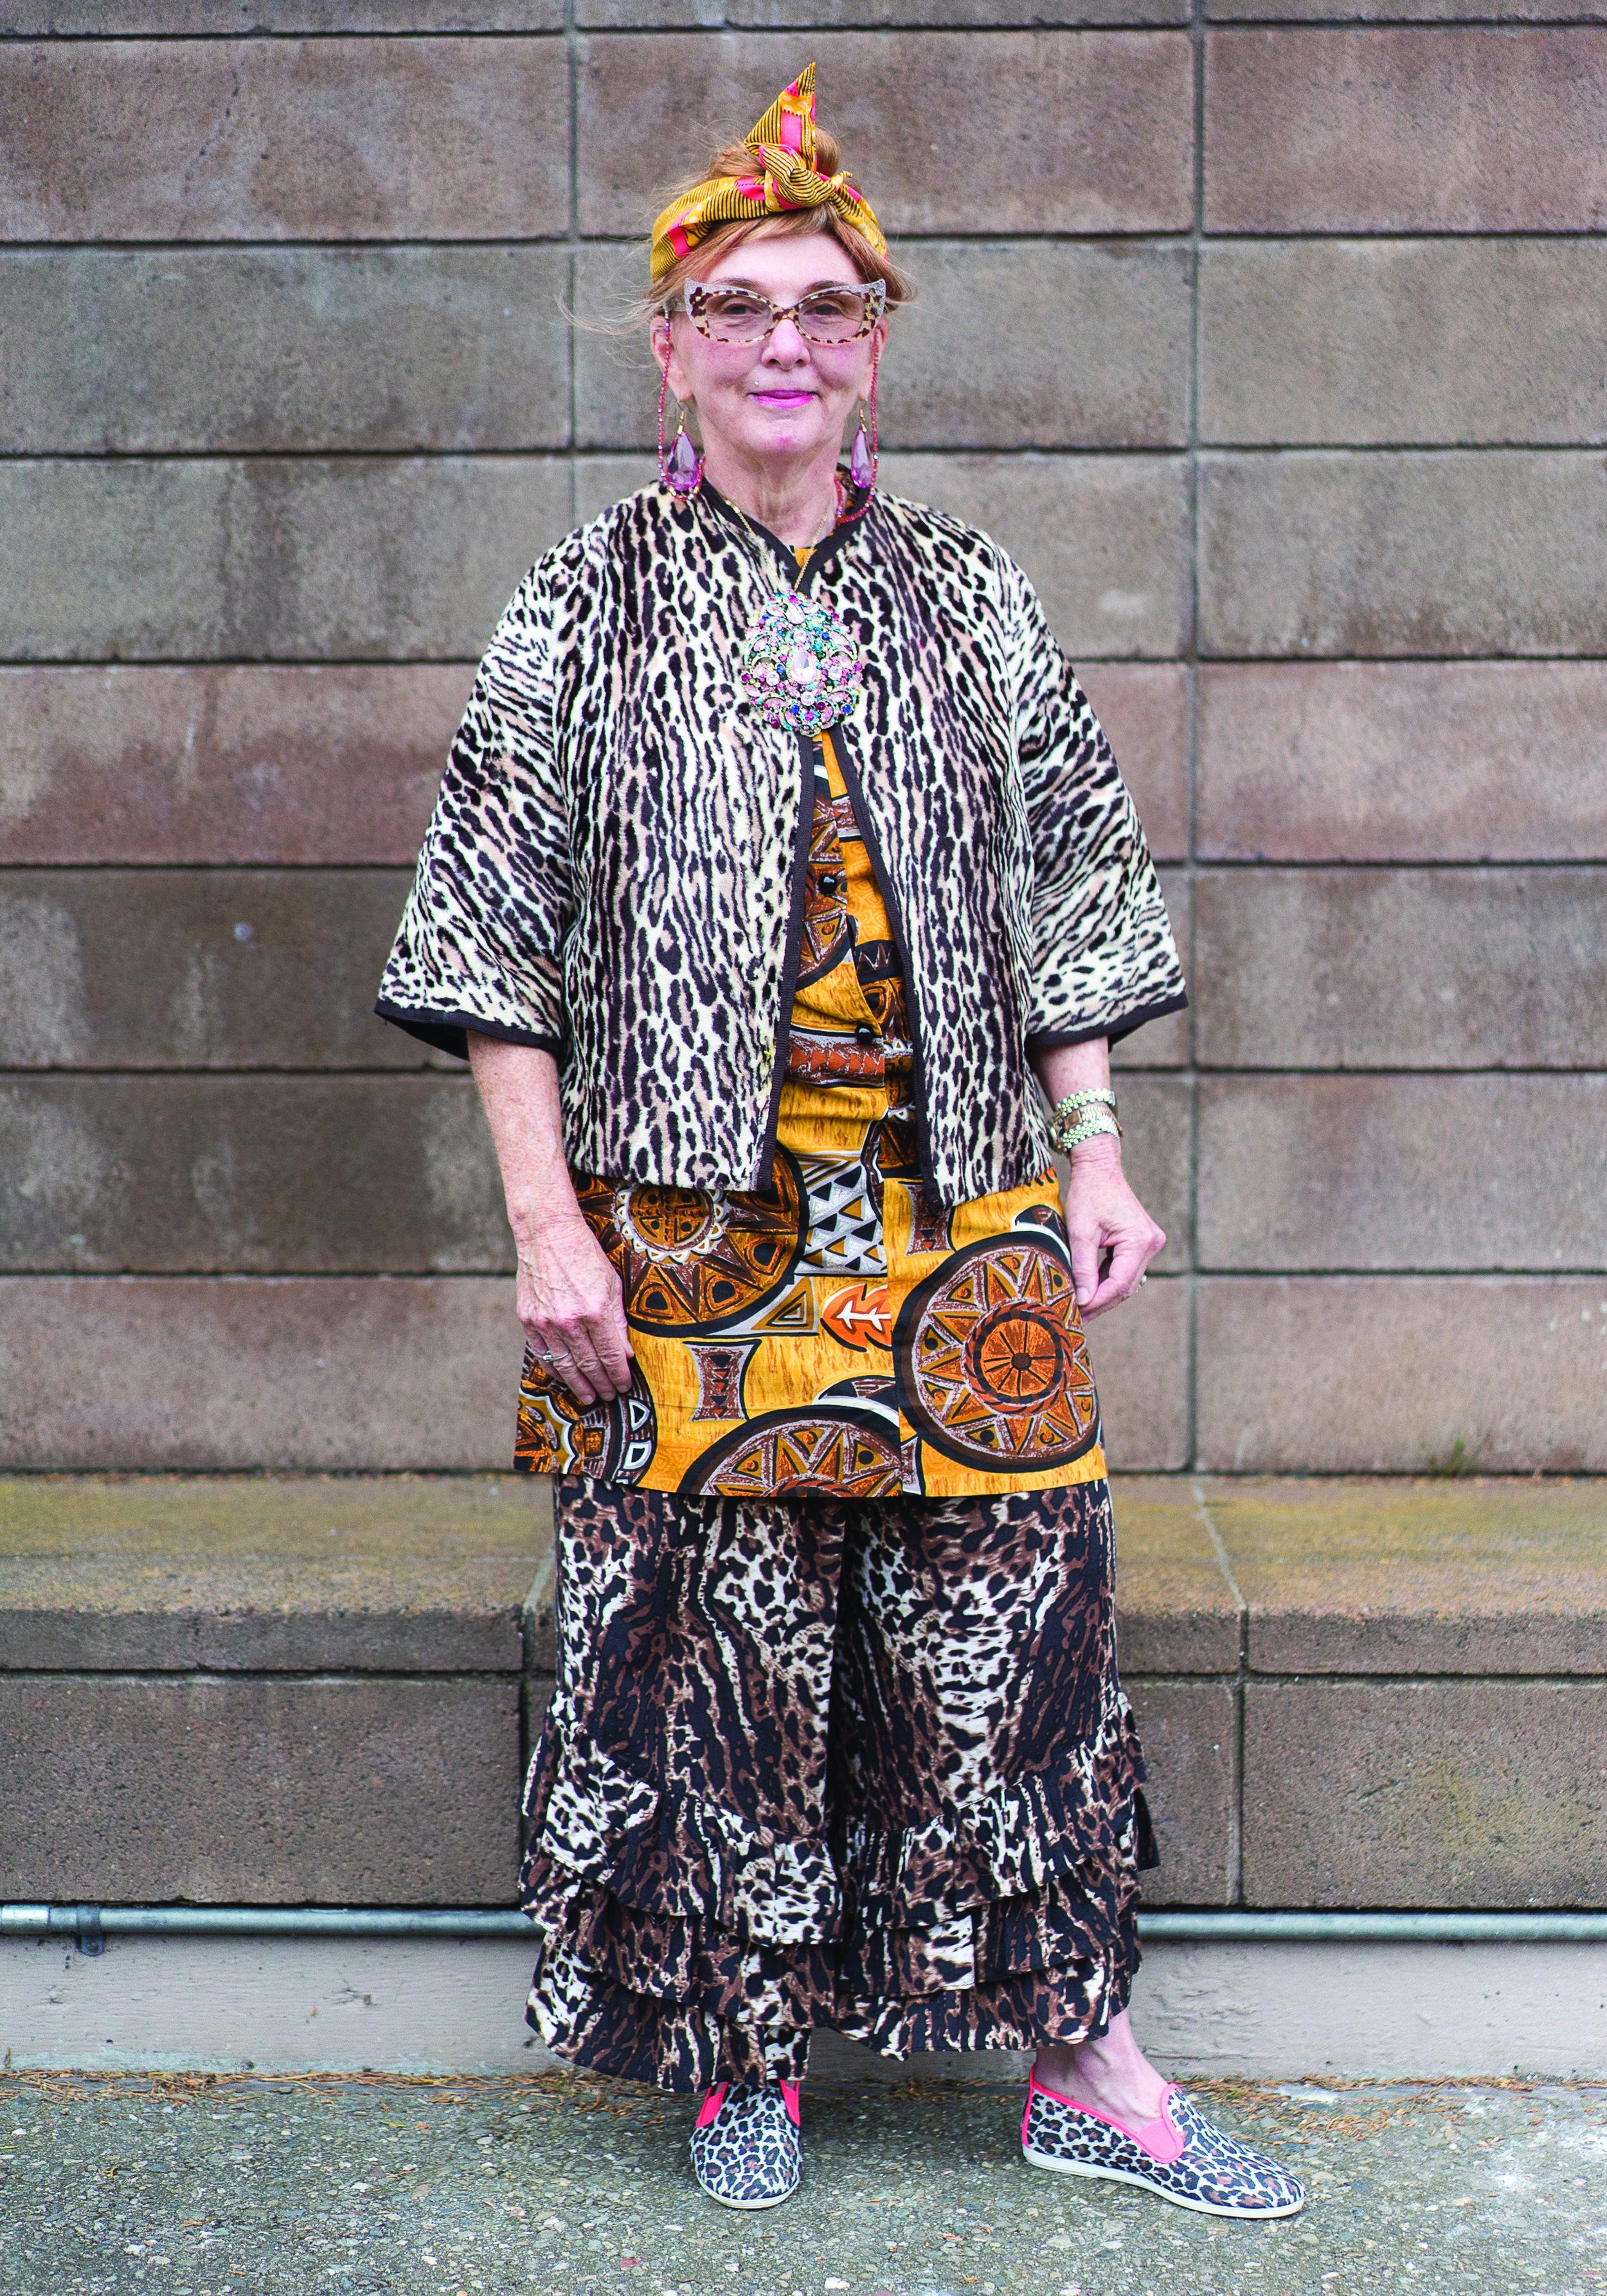 Pattie, 64